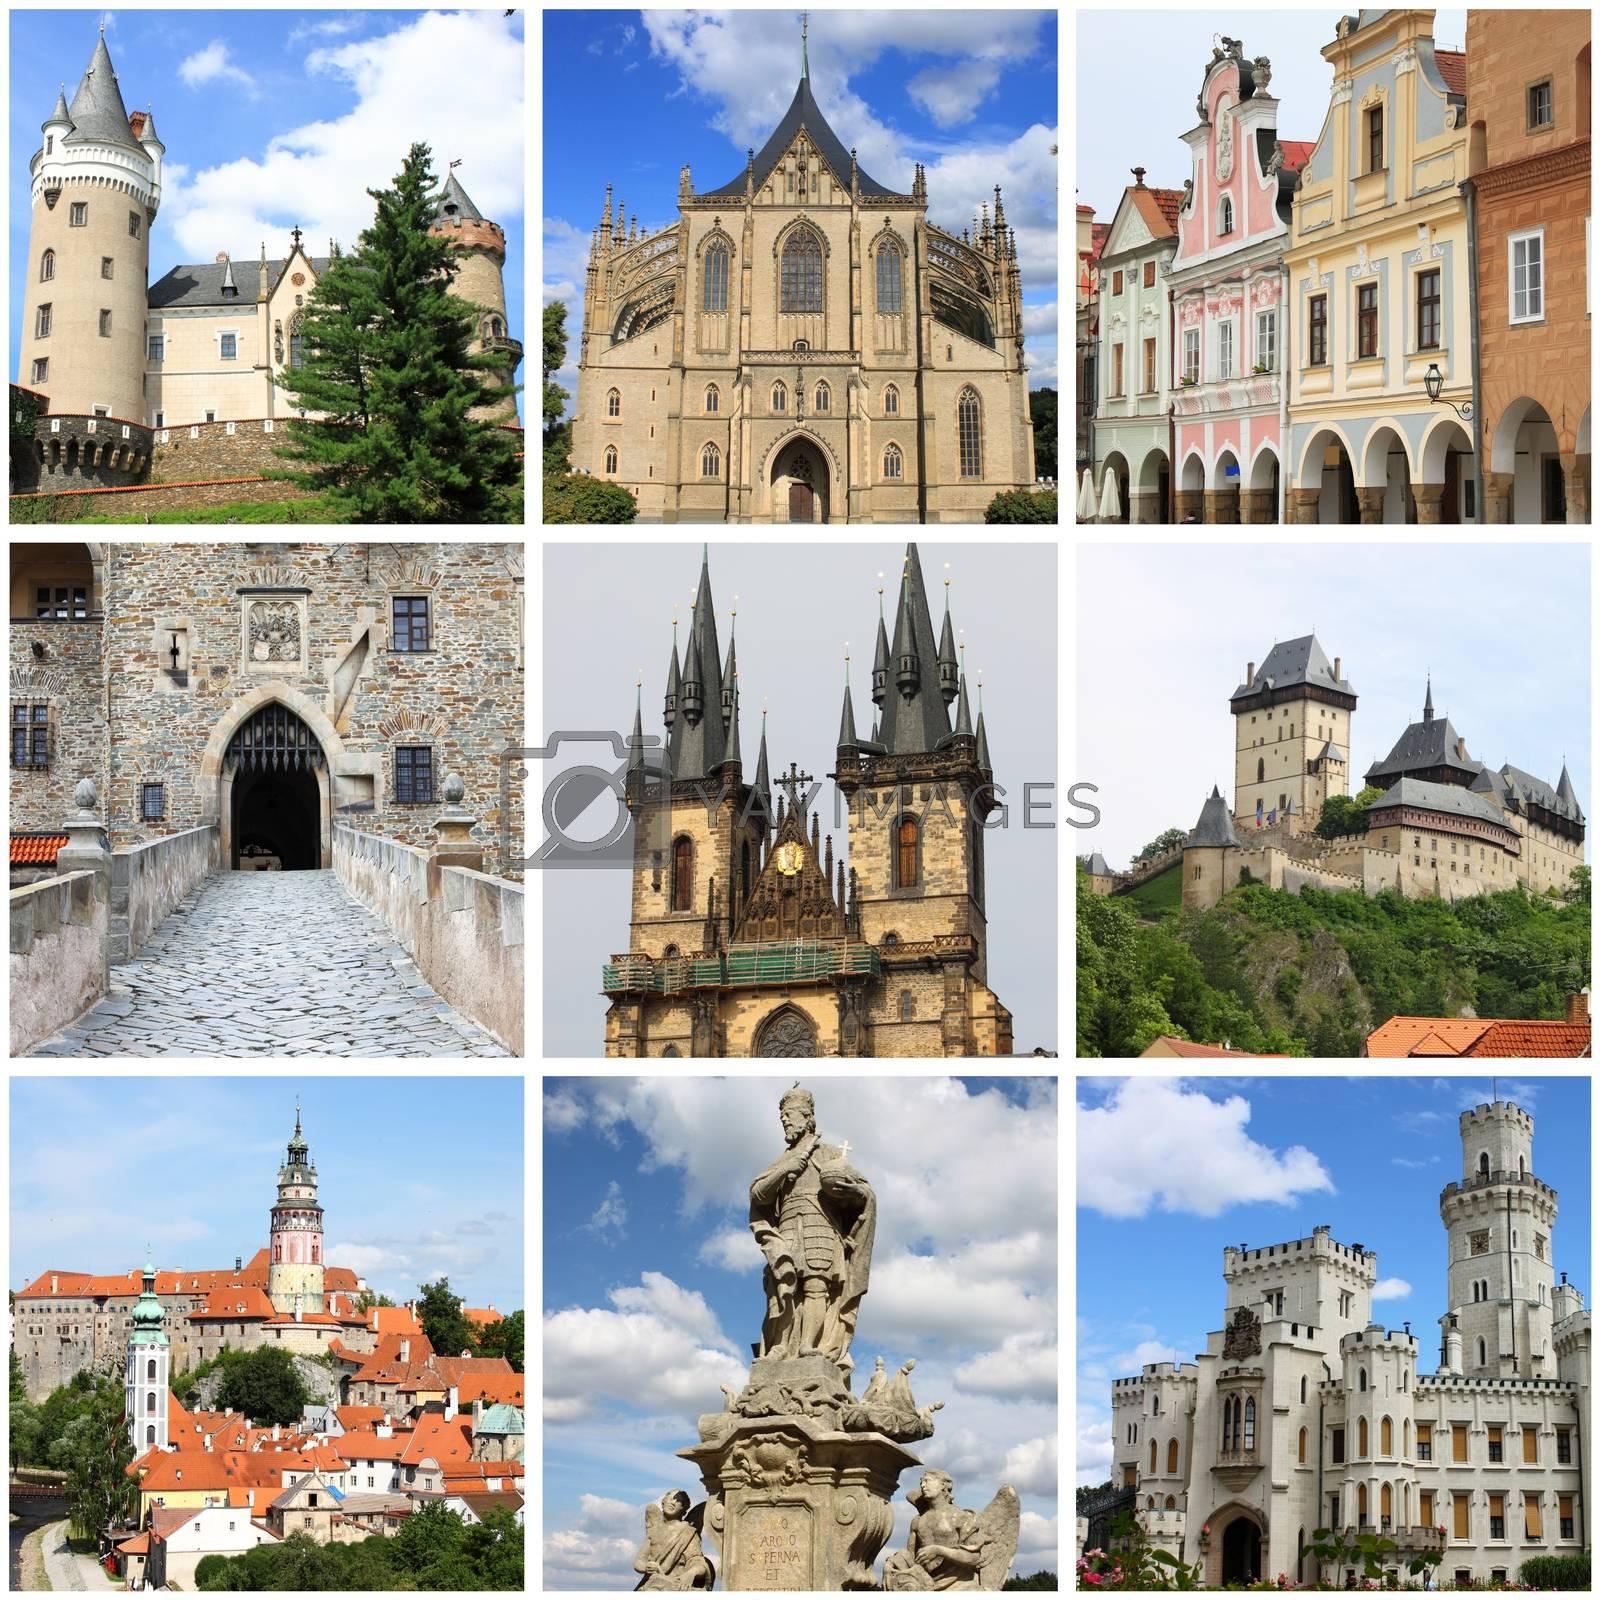 Bohemia landmarks collage by alessandro0770